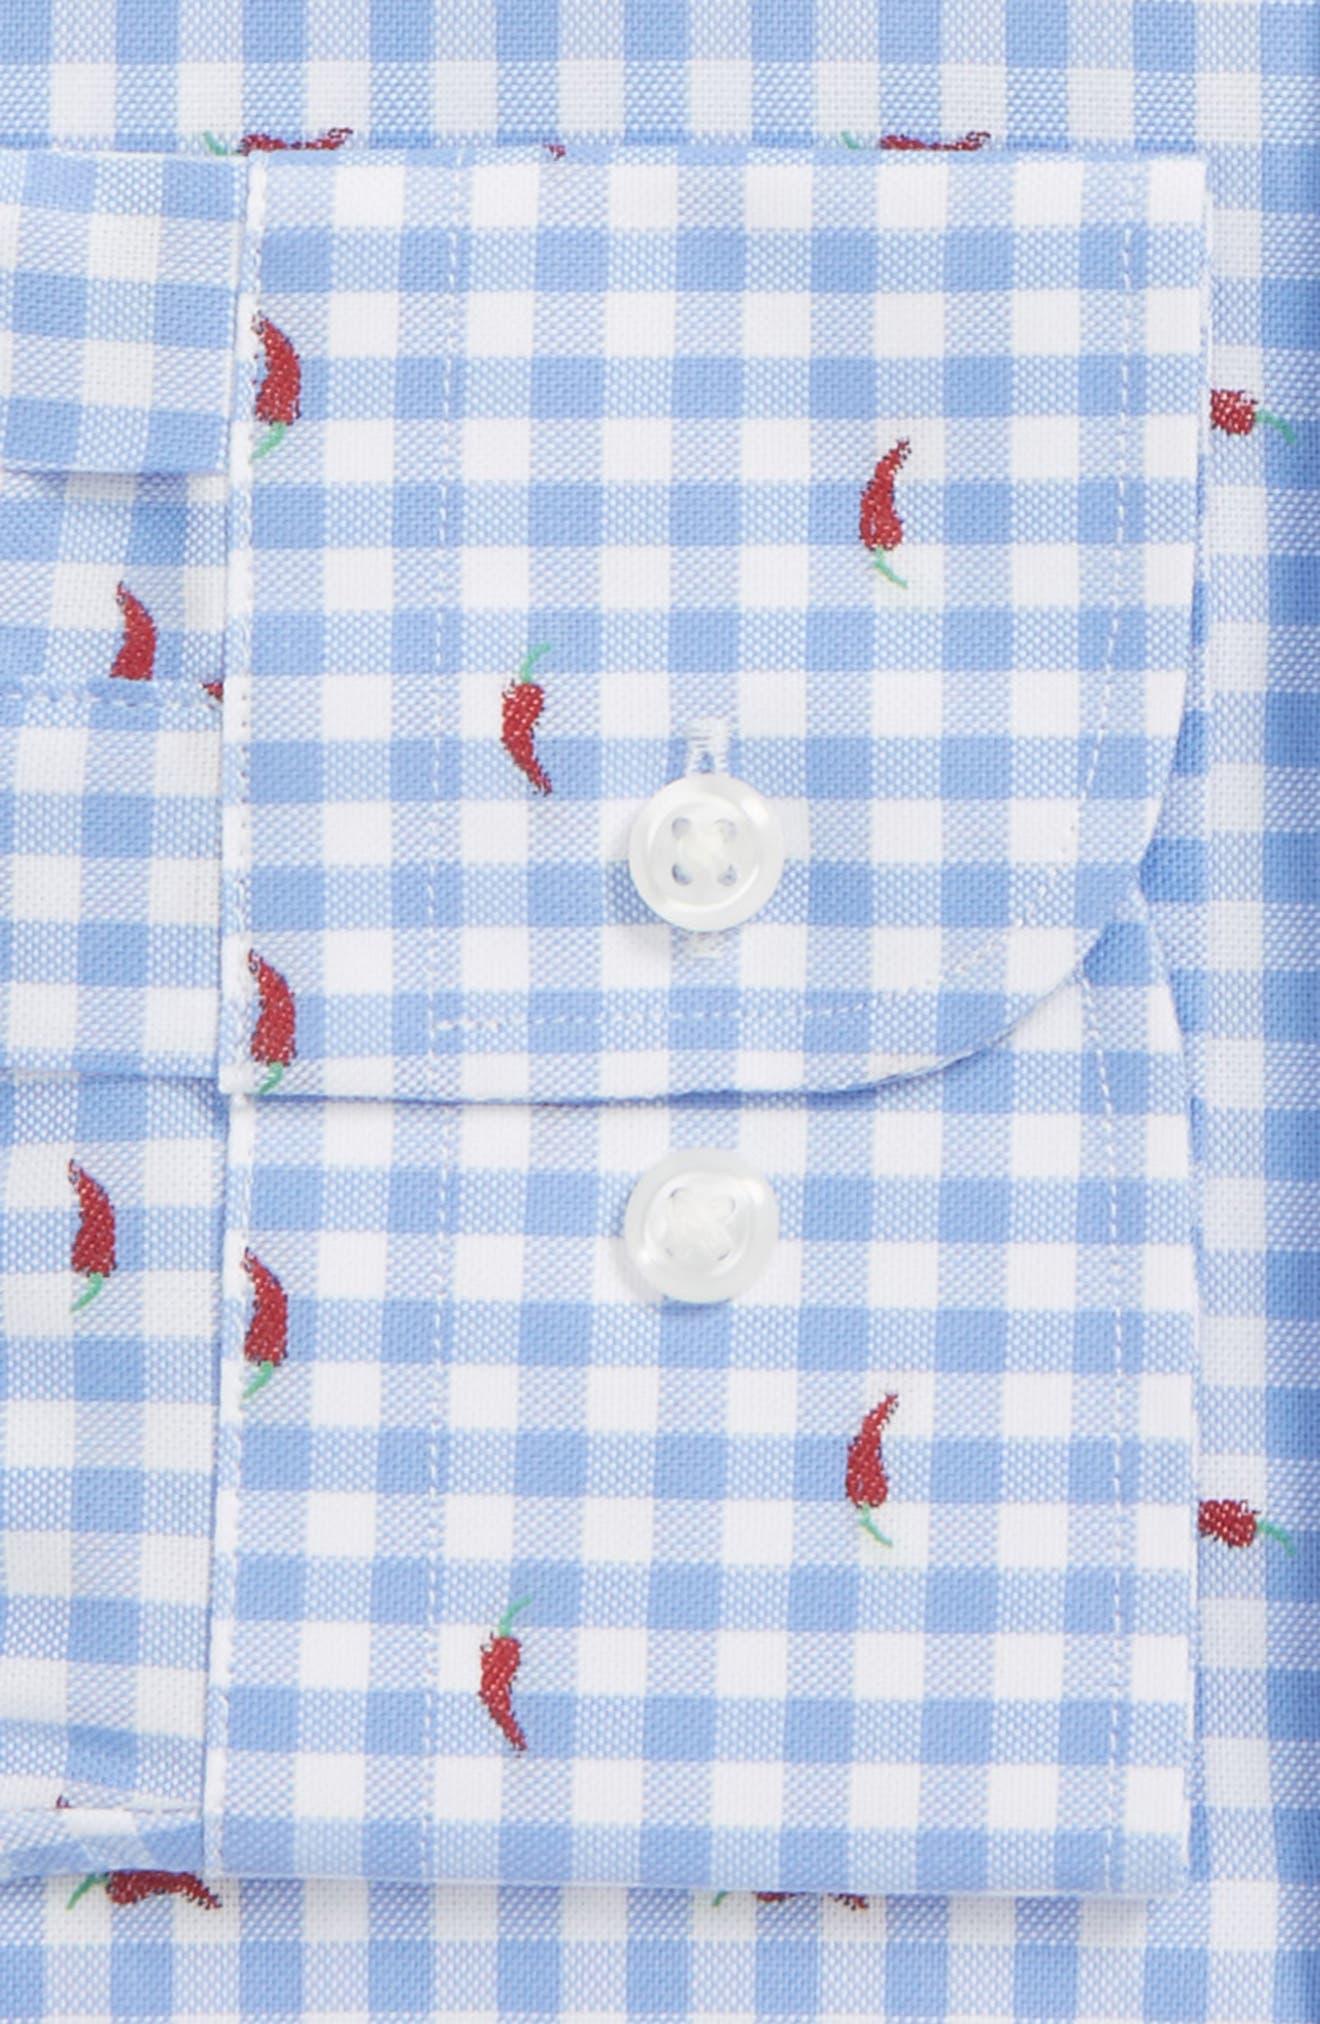 Trim Fit Gingham Chili Pepper Dress Shirt,                             Alternate thumbnail 5, color,                             Blue Hydrangea